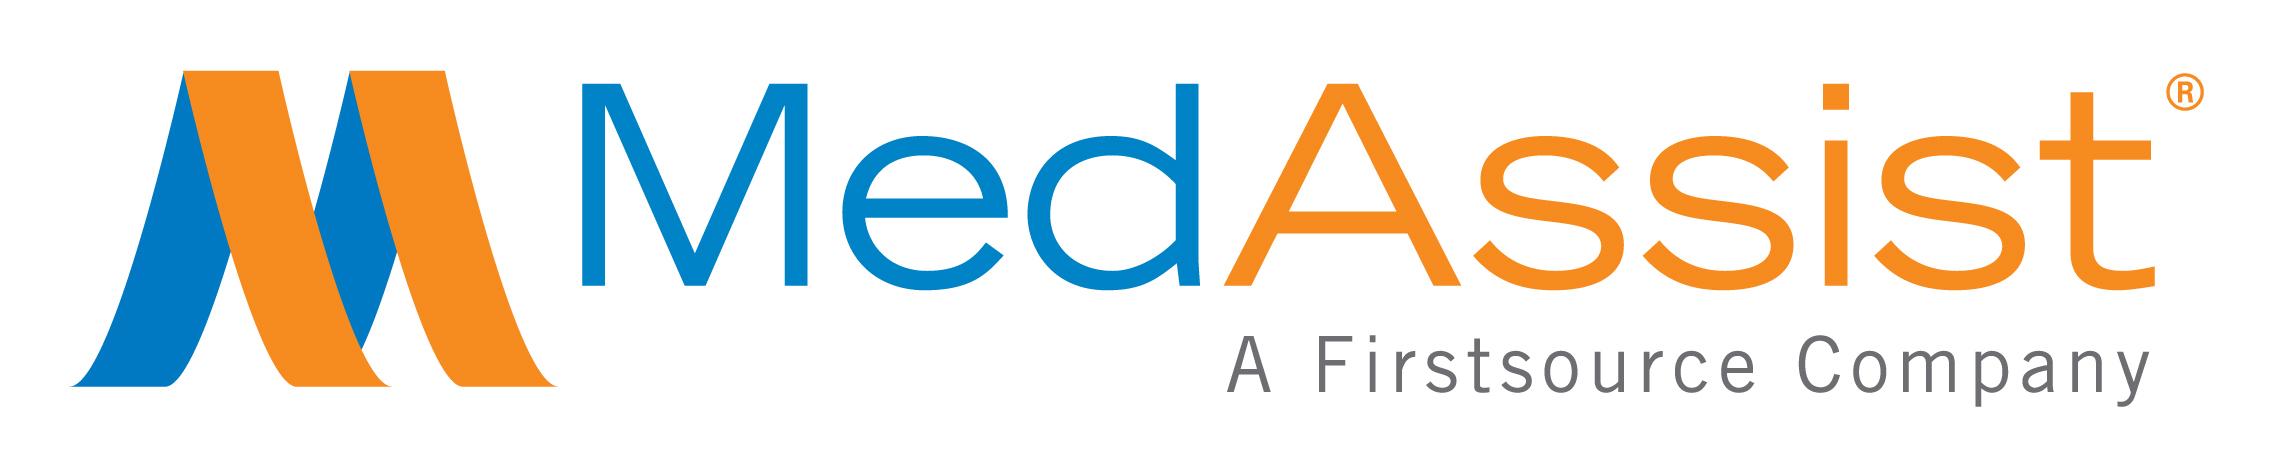 MedAssist logo CMYK 2